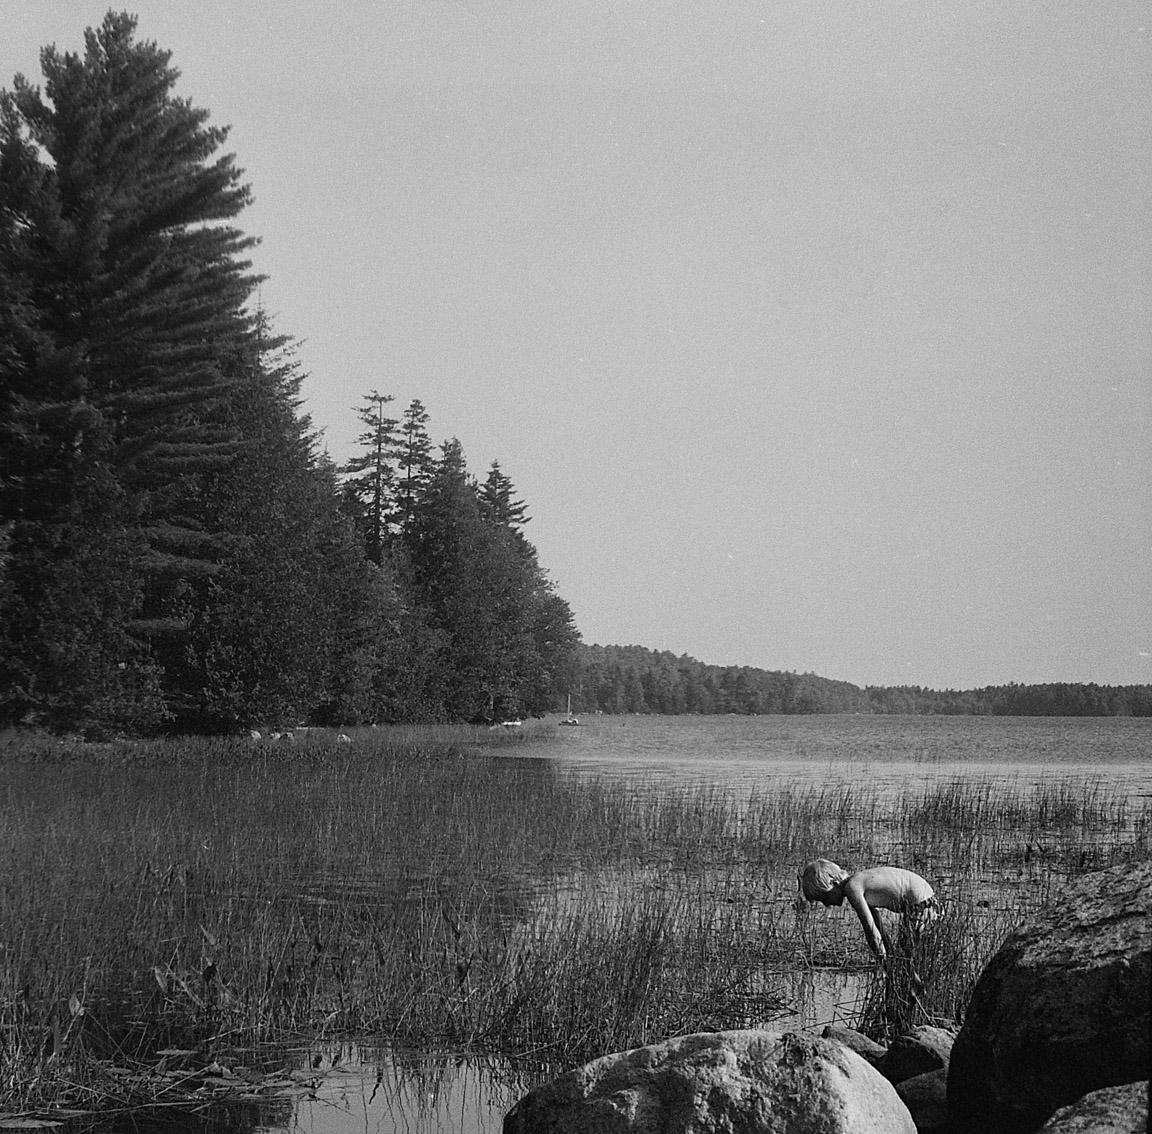 Maine_XP2_edit-6